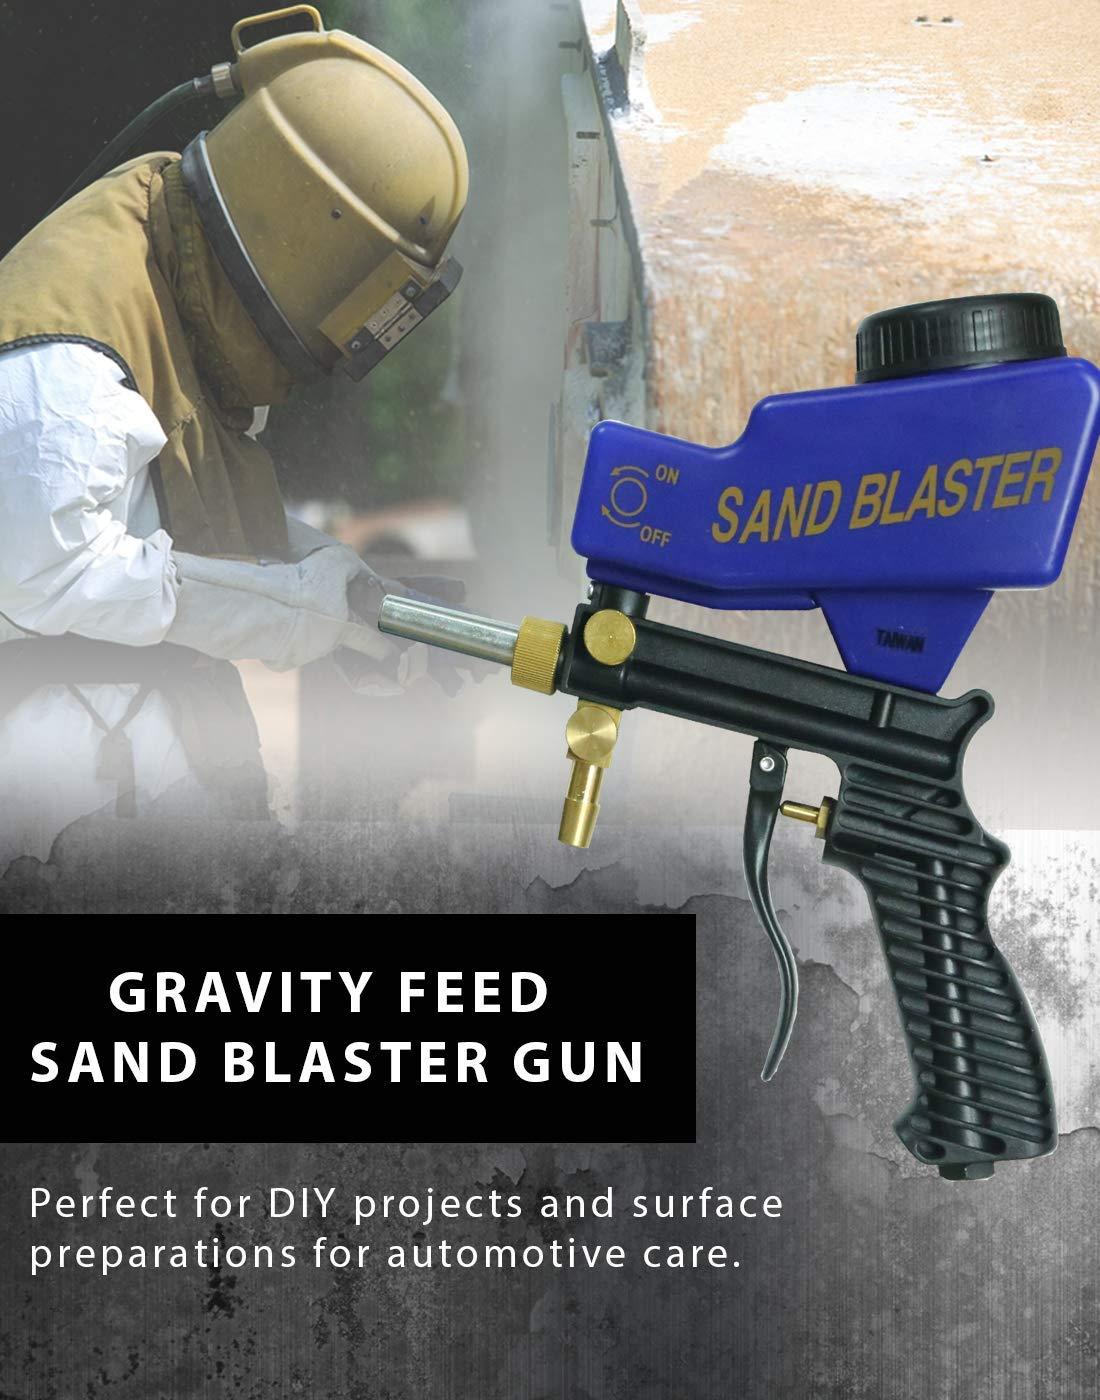 Improved Sandblaster Sand Blaster Gun Kit, Soda Blaster, Professional Sand Blasters, Media Sandblaster Gun, Spot Blaster, Media Blaster Sandblast Gun, Walnut, Bead, Sand Blast Blasting Equipment. (A by LE LEMATEC (Image #7)